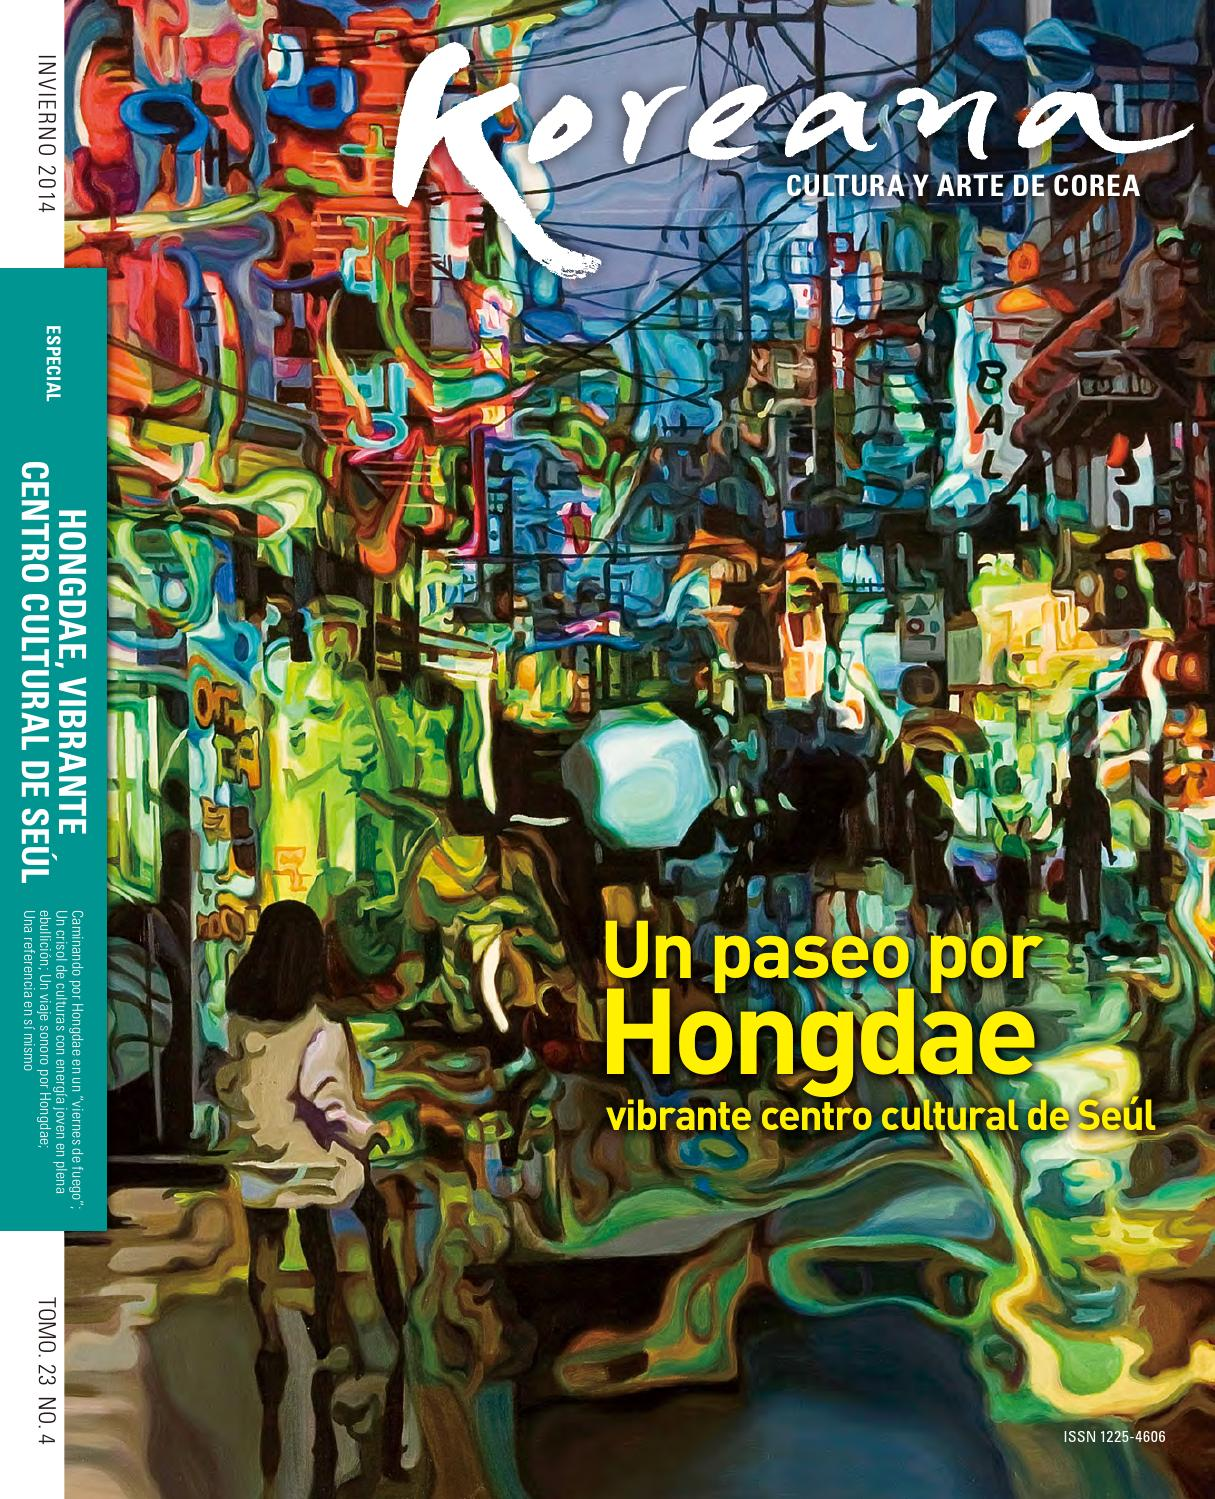 Koreana Winter 2014 (Spanish) by The Korea Foundation - issuu